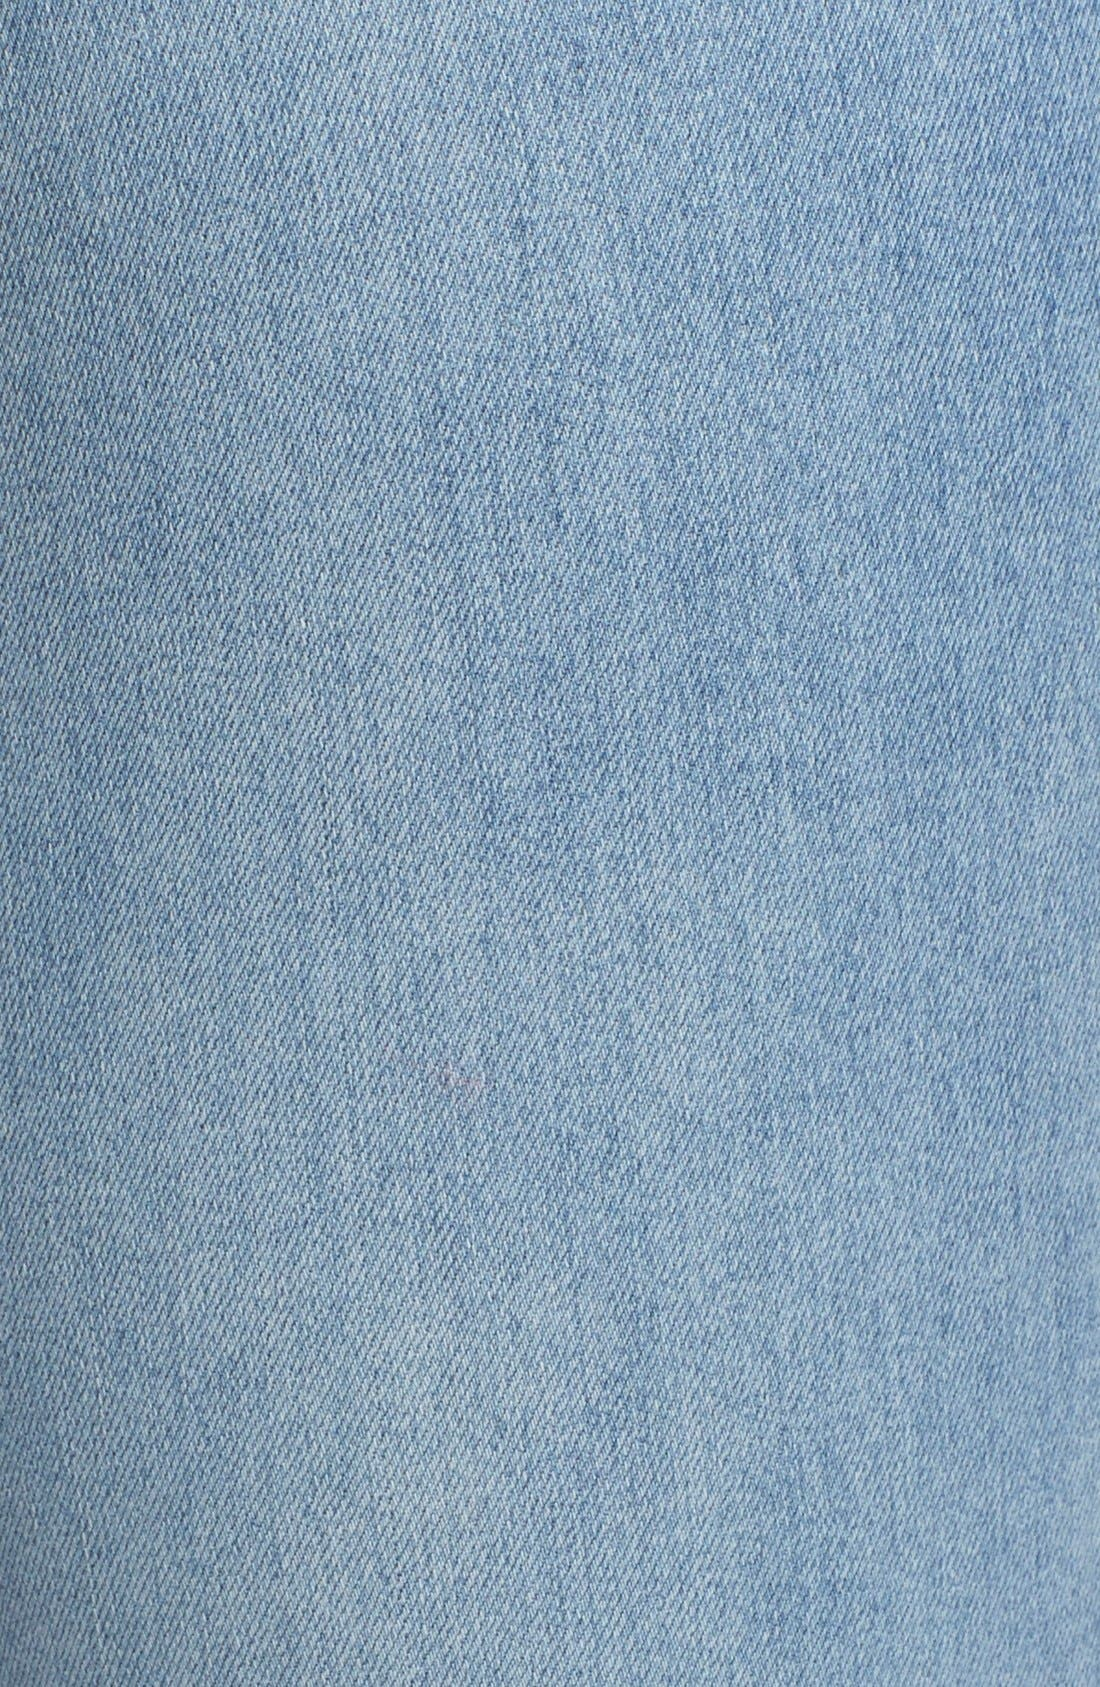 Destroyed Skinny Jeans,                             Alternate thumbnail 5, color,                             400